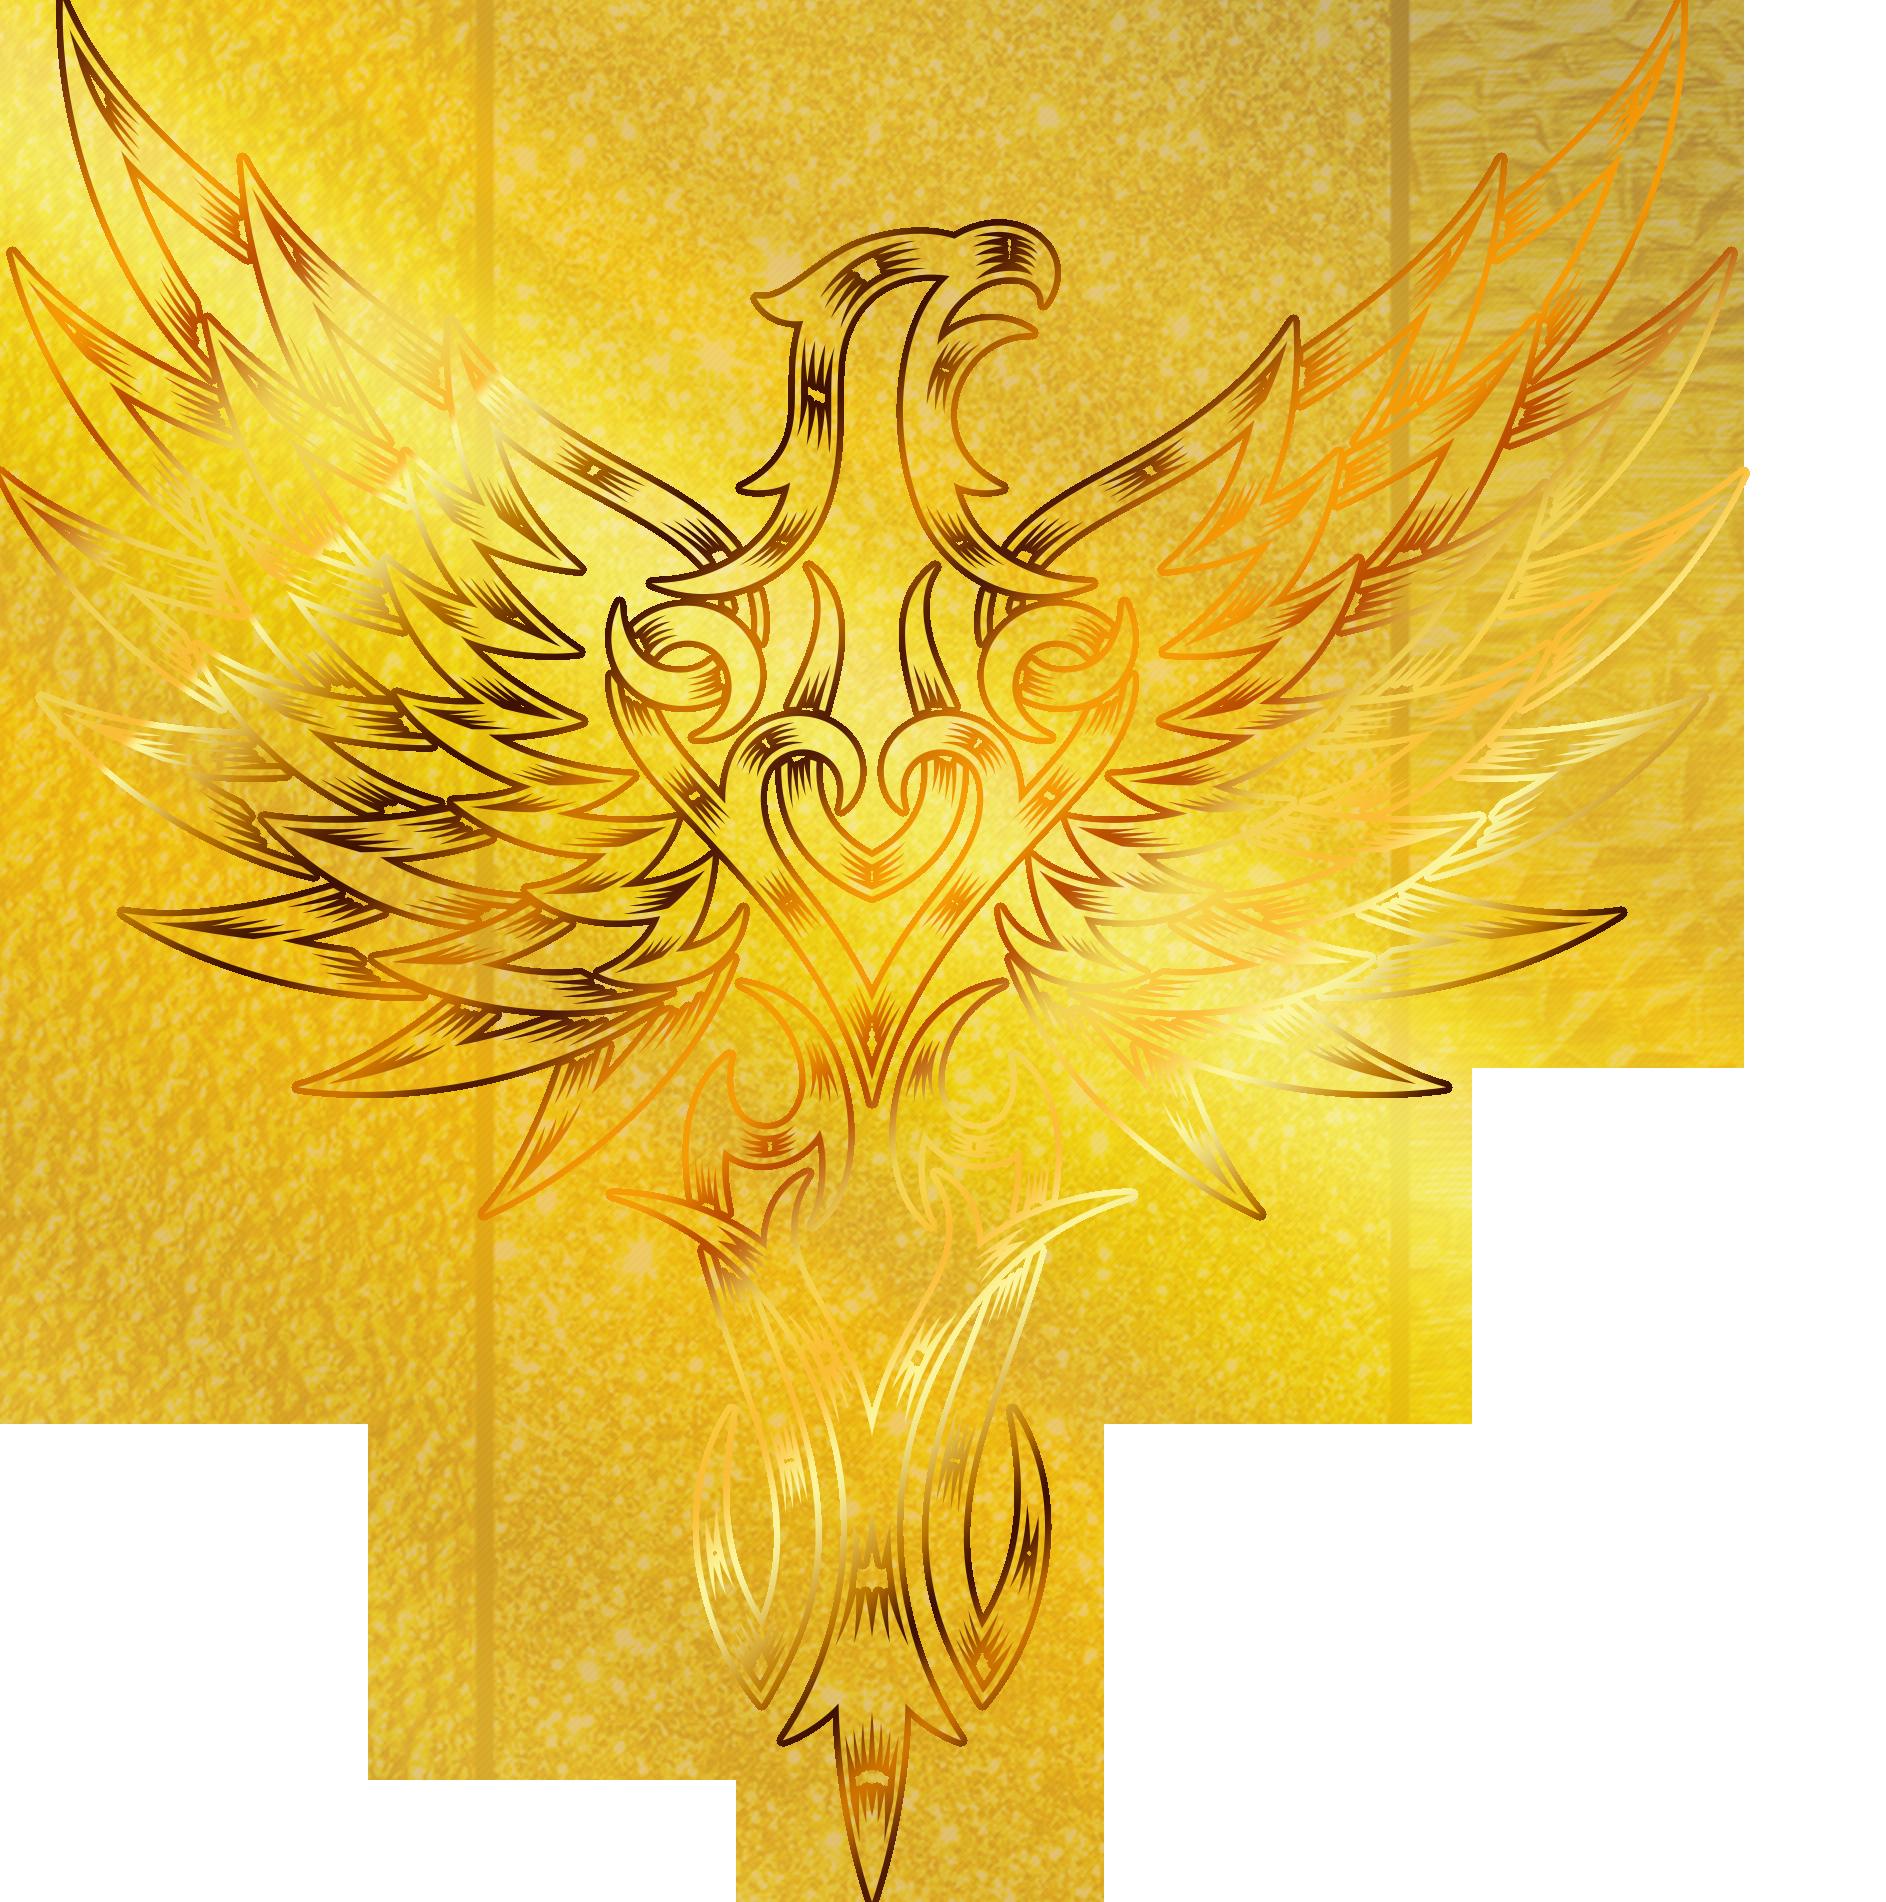 Golden eagle flight wings. Wing clipart supernatural